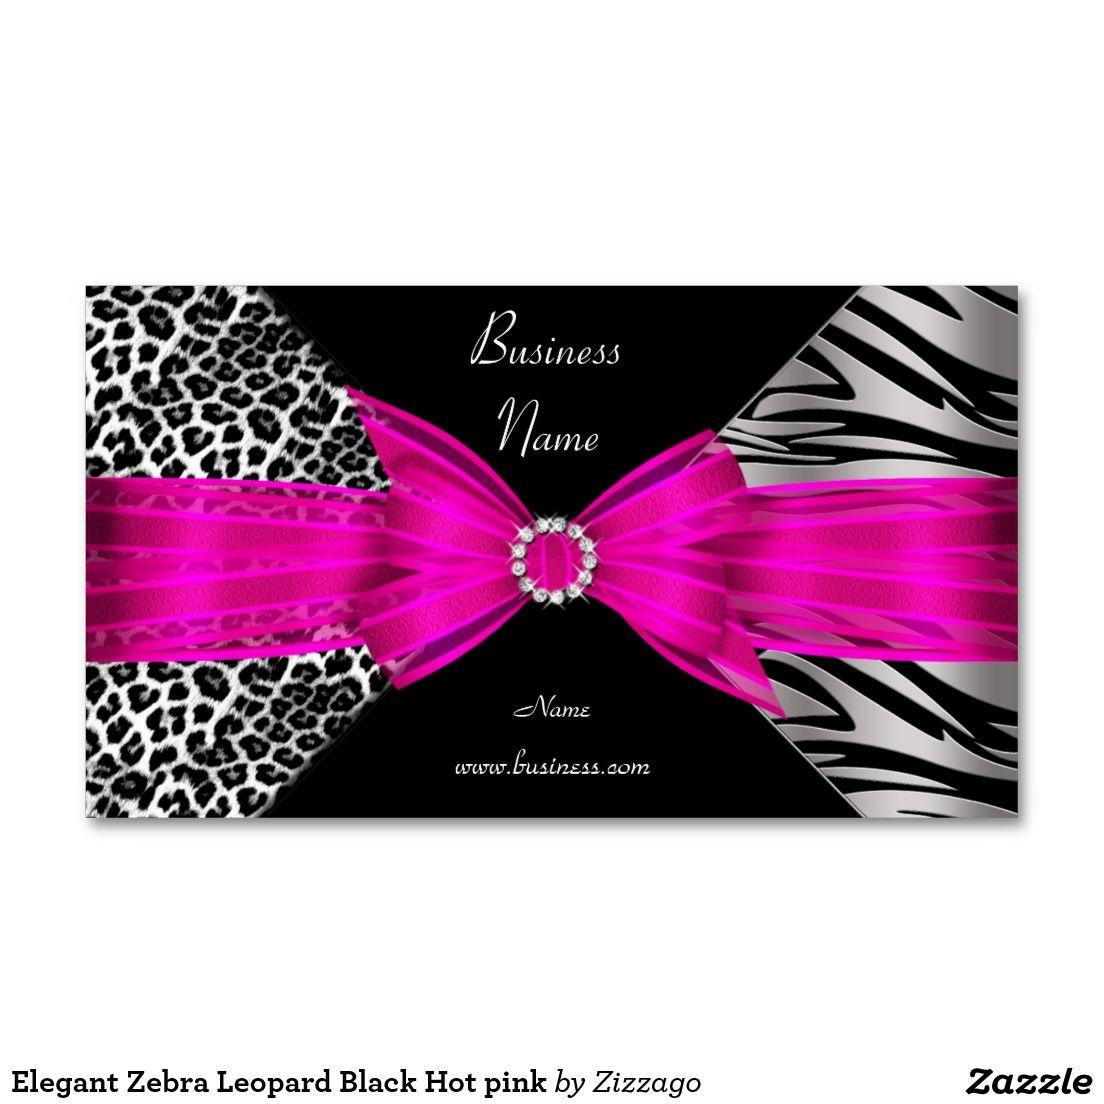 Zebra Leopard Black Hot pink Business Card